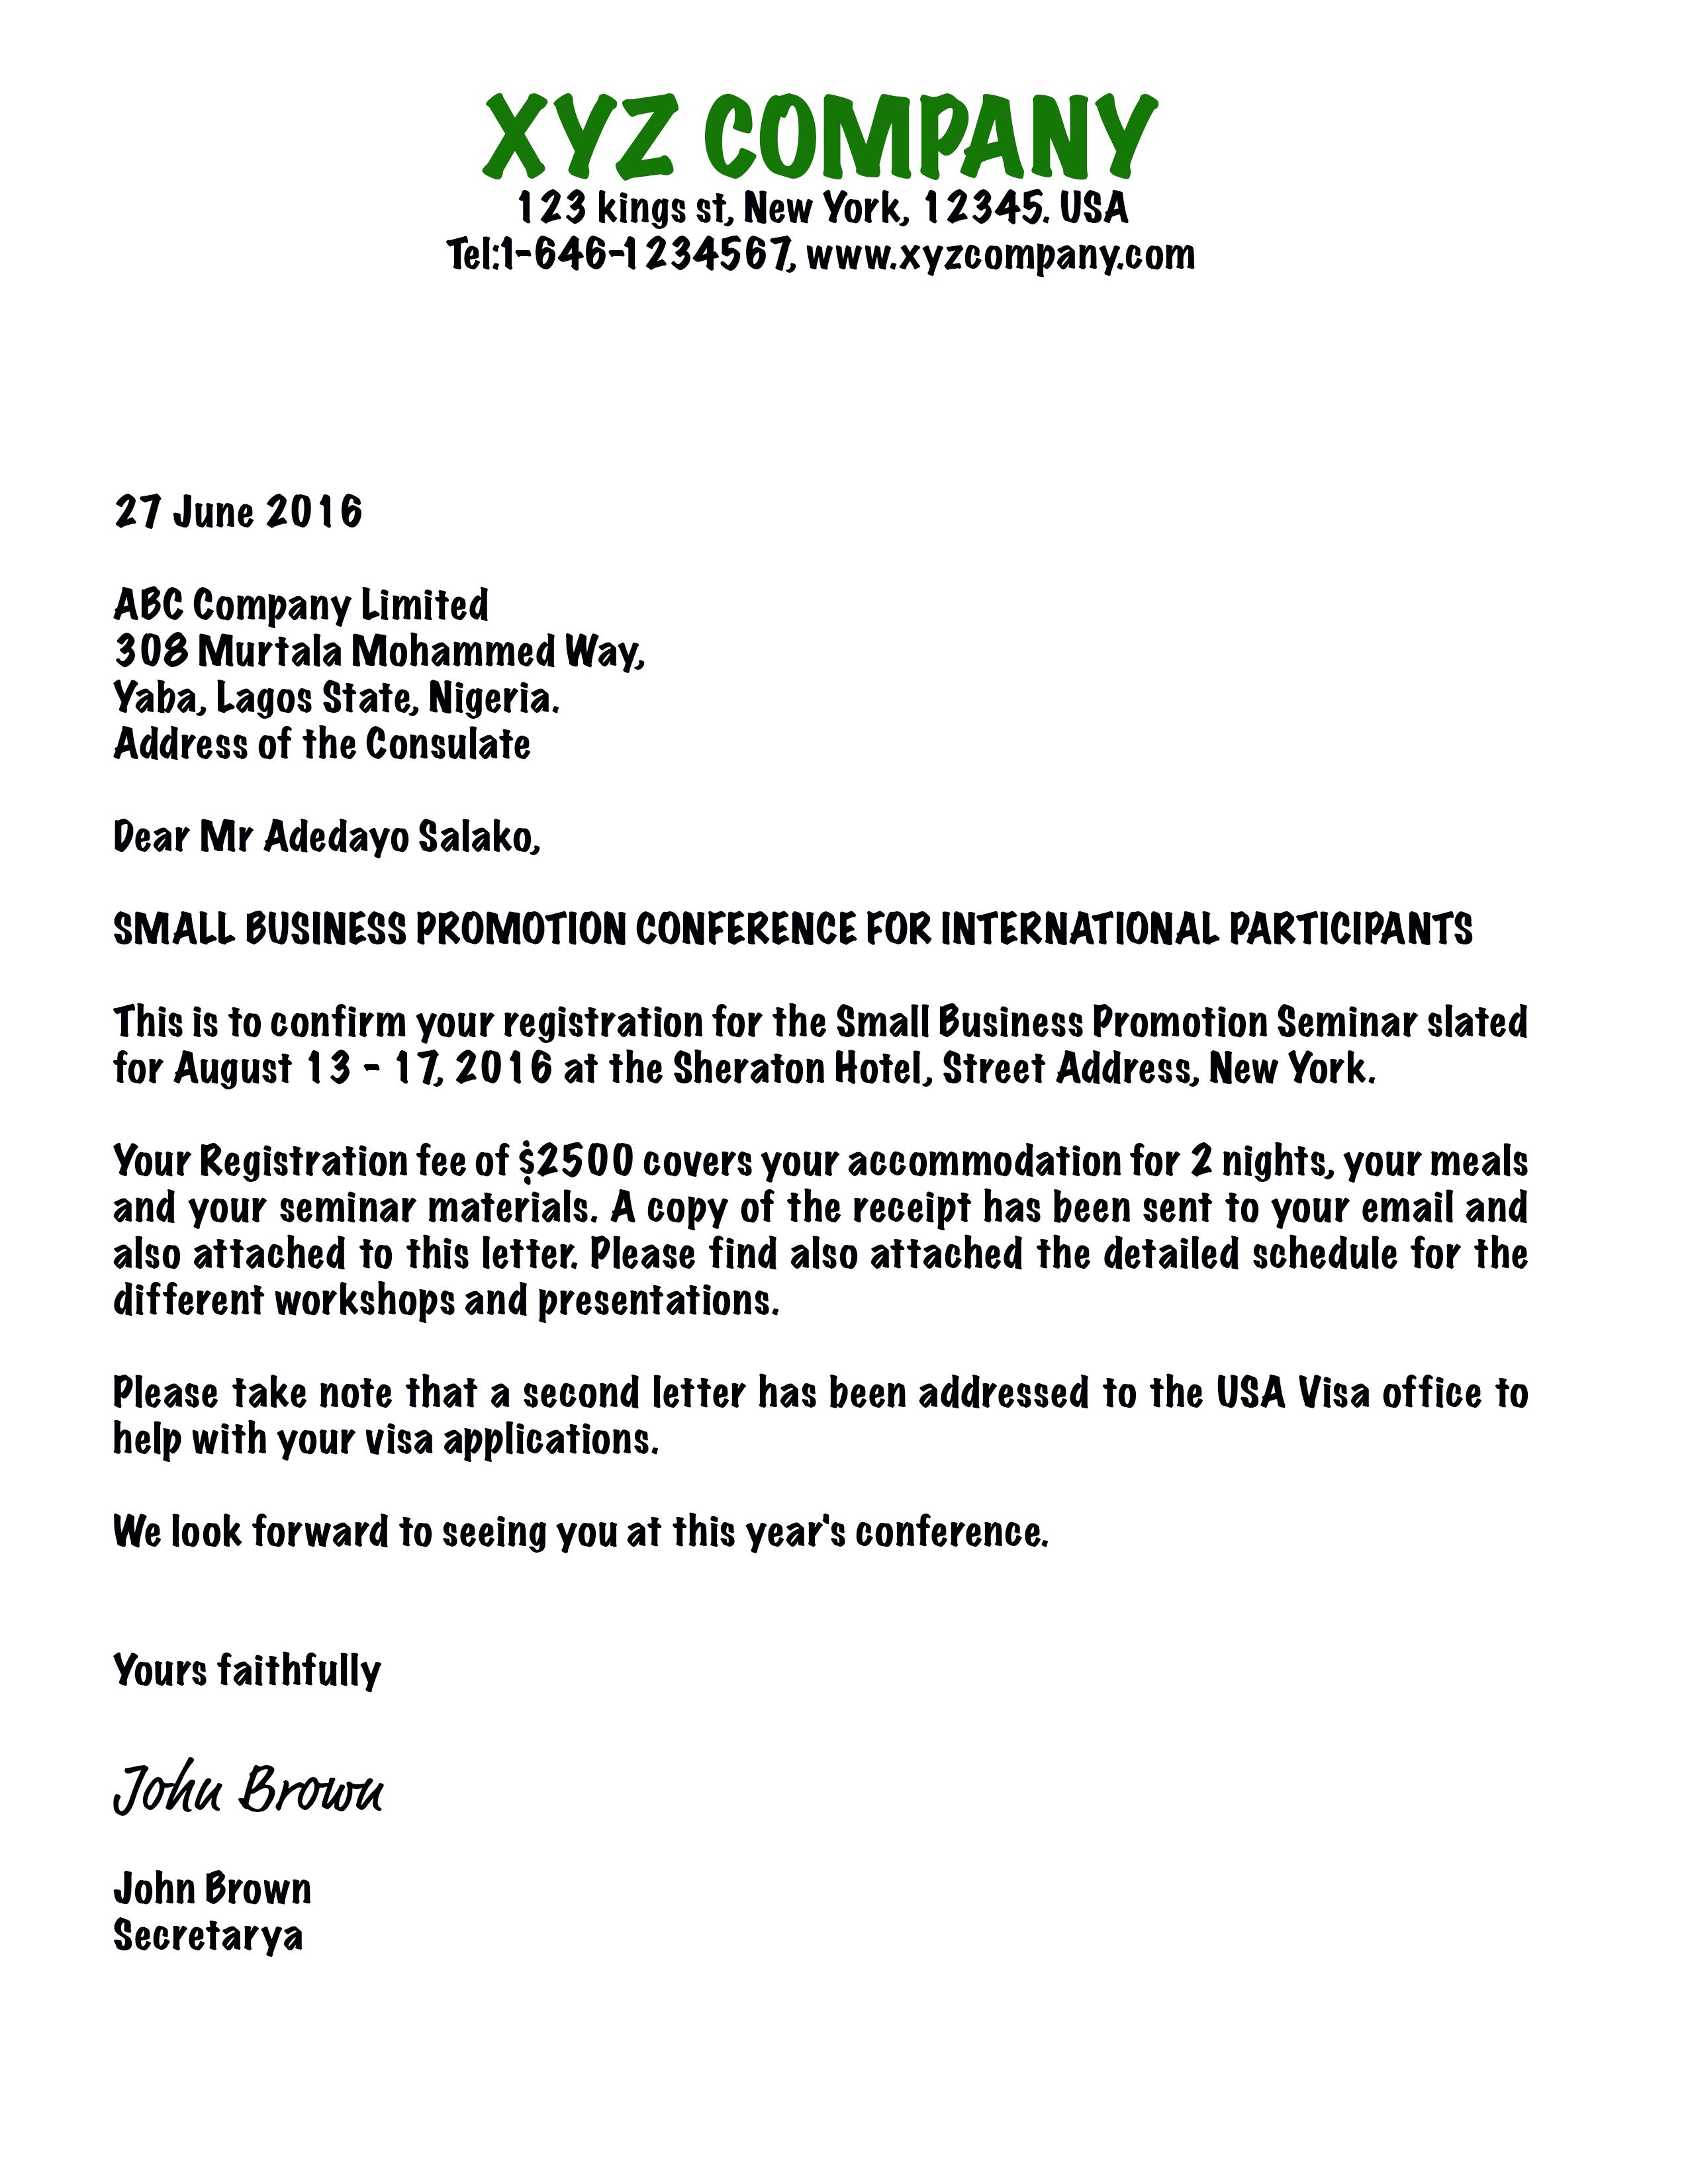 Sample business invitation letter for visa attend party general sponsor letter for event hospice nurse cover charity sponsorship sample asking money business invitation along with astounding stopboris Choice Image